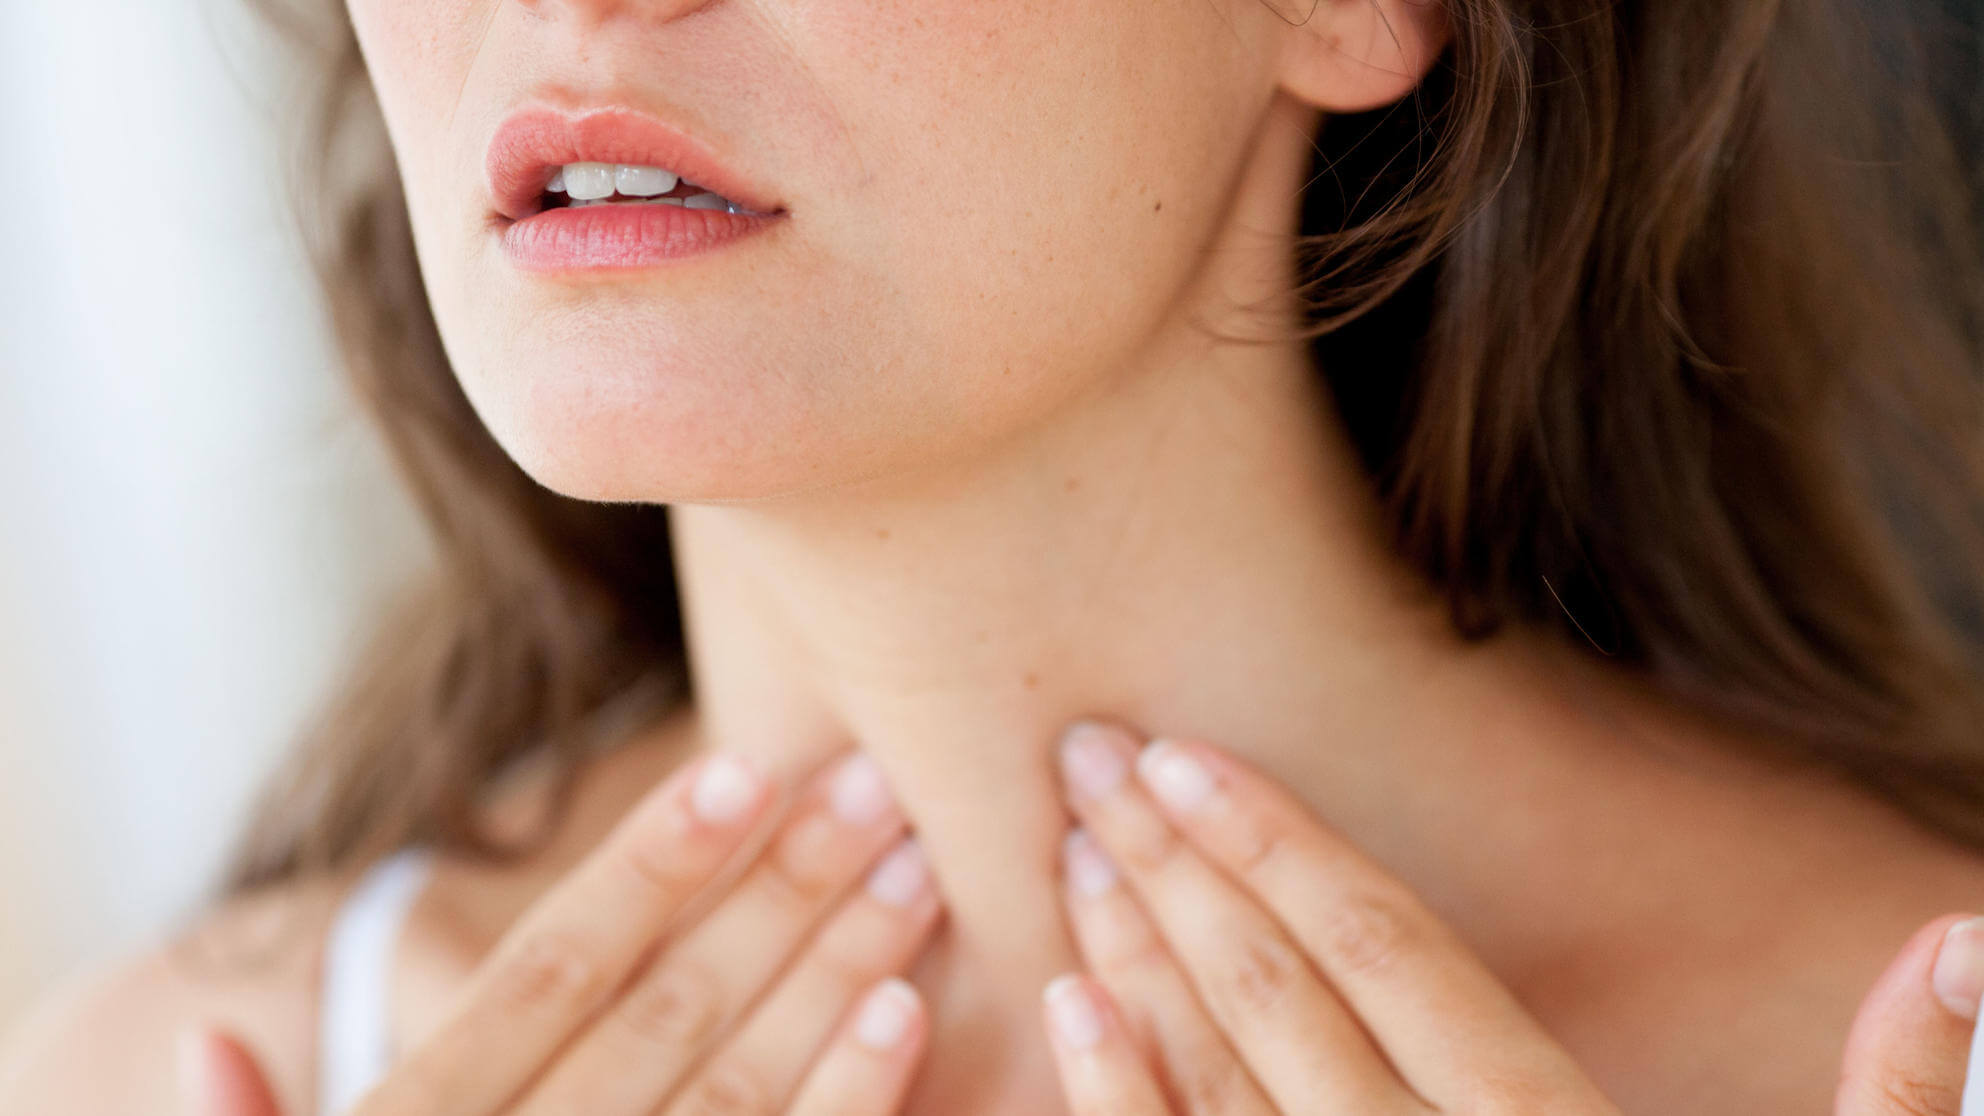 Woman self-examining her throat.